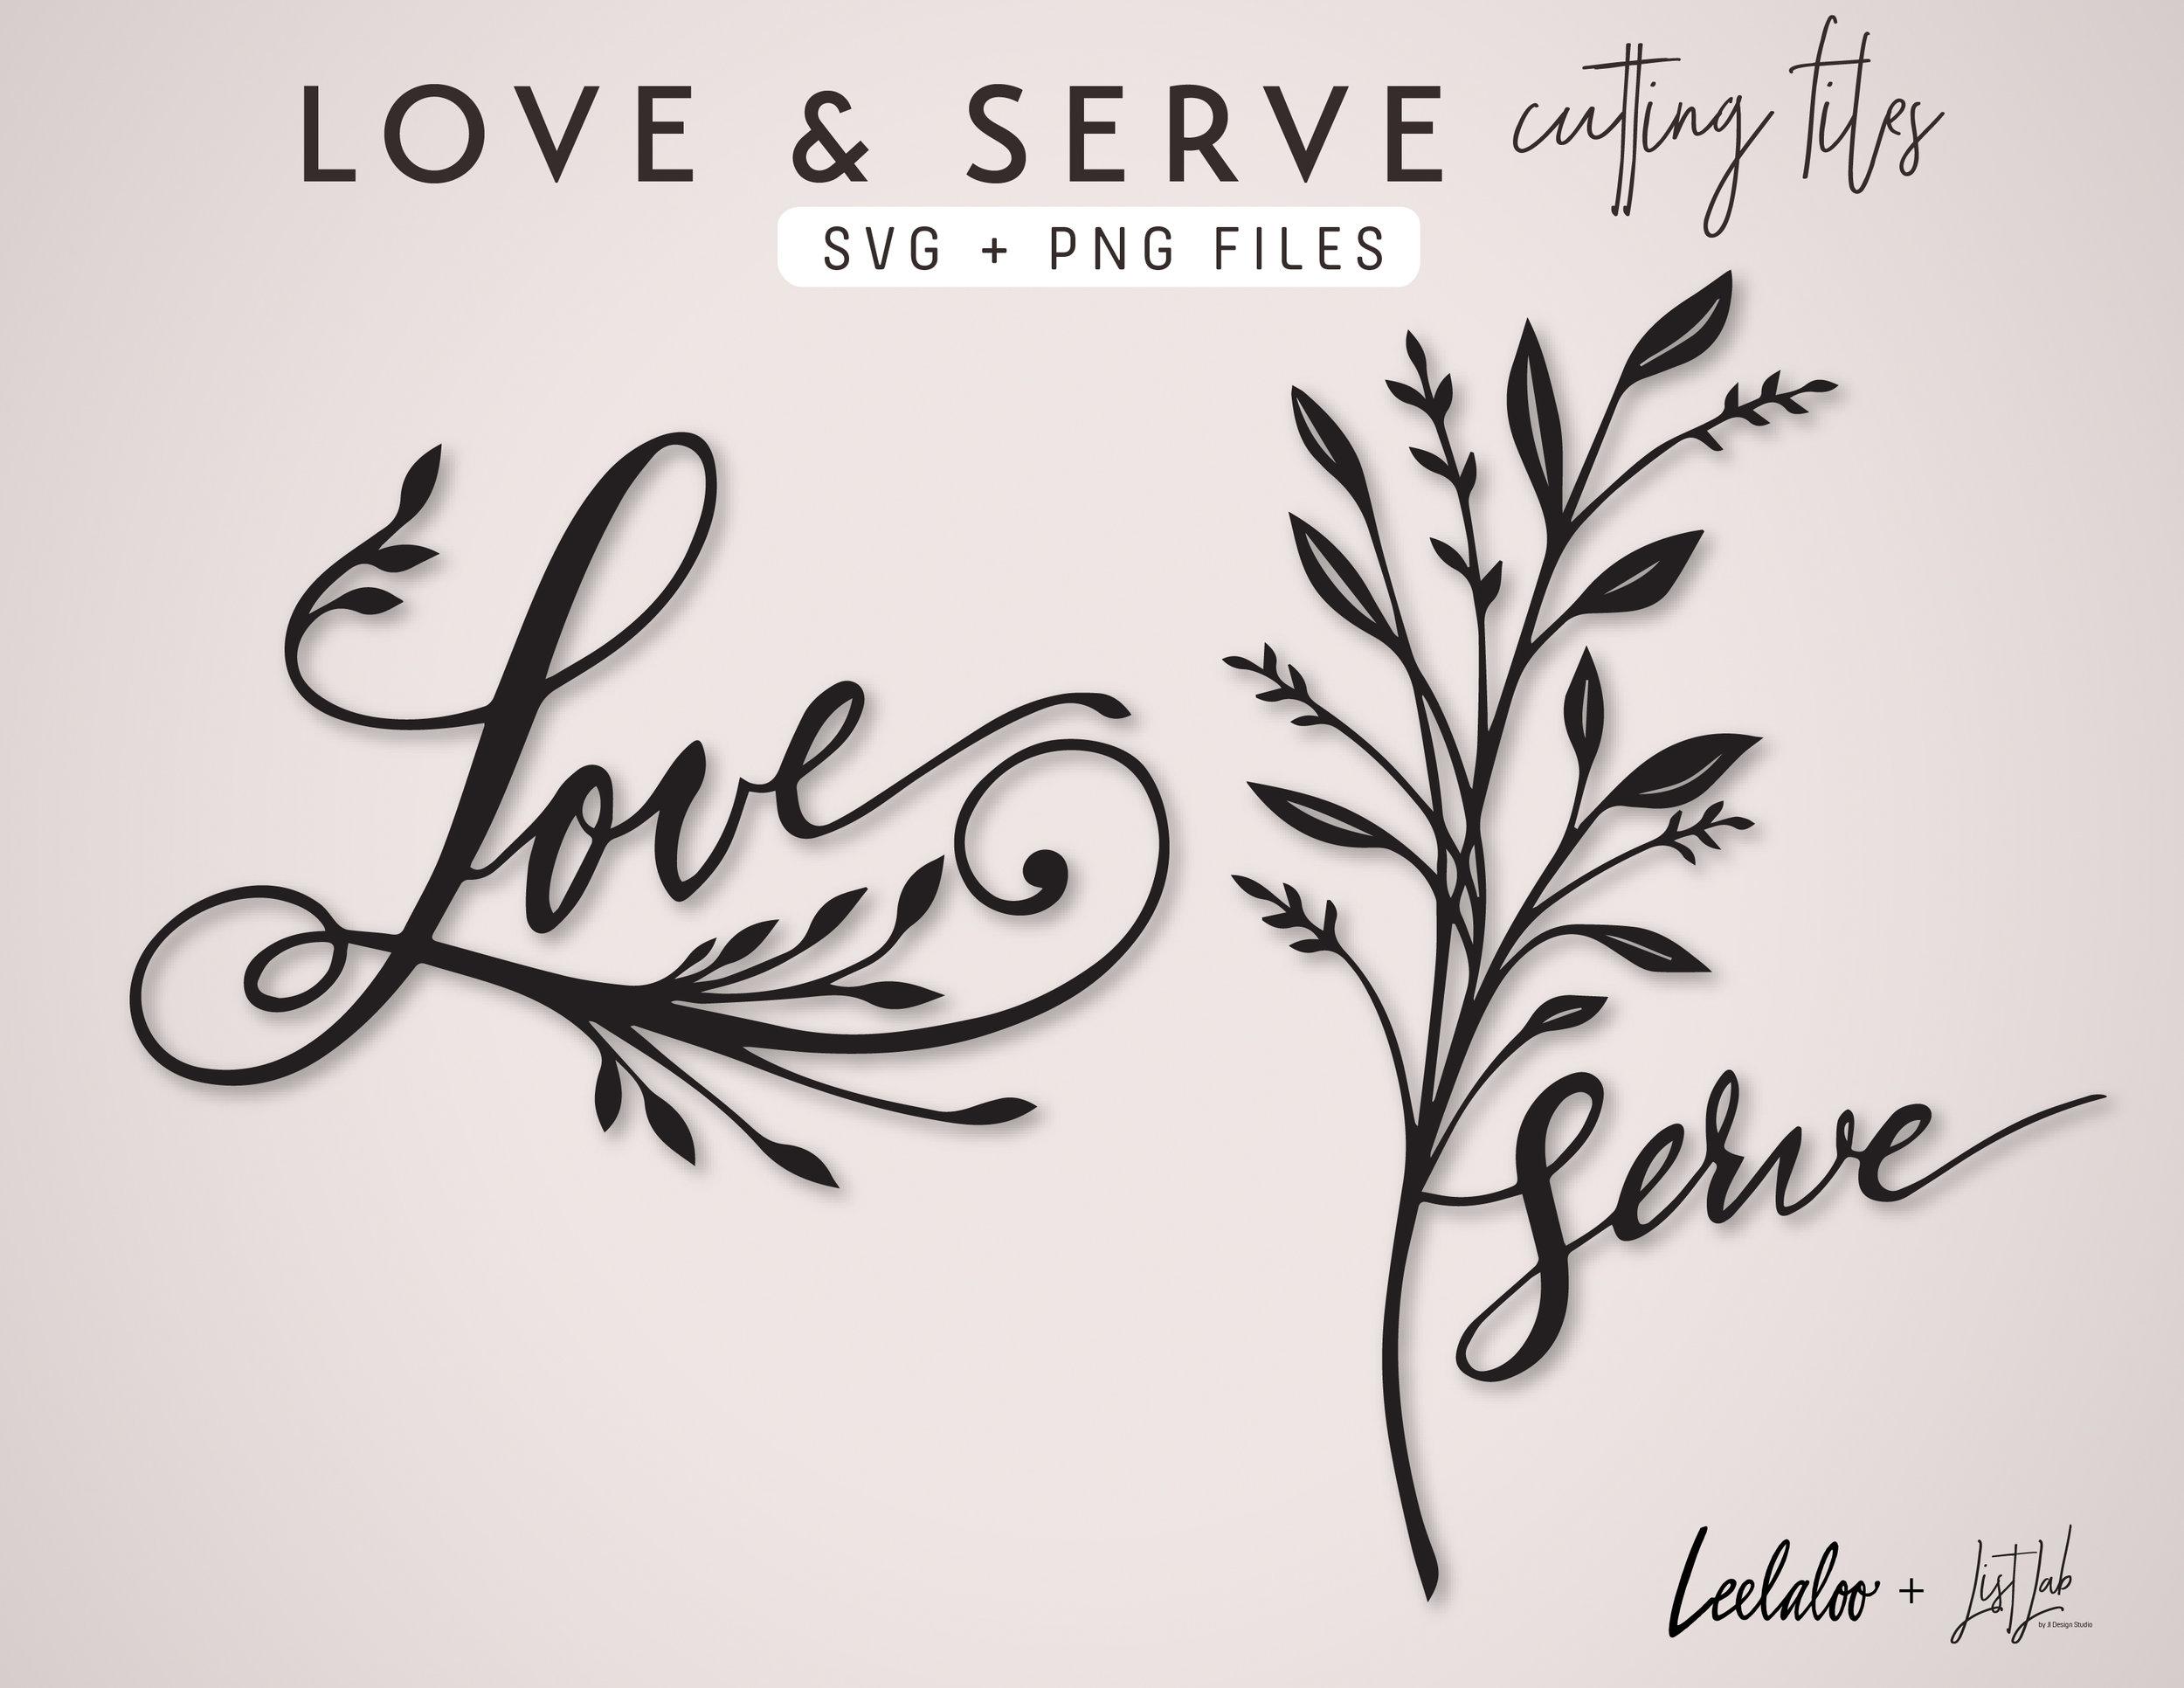 leelaloo_love_serve-11-11.jpg